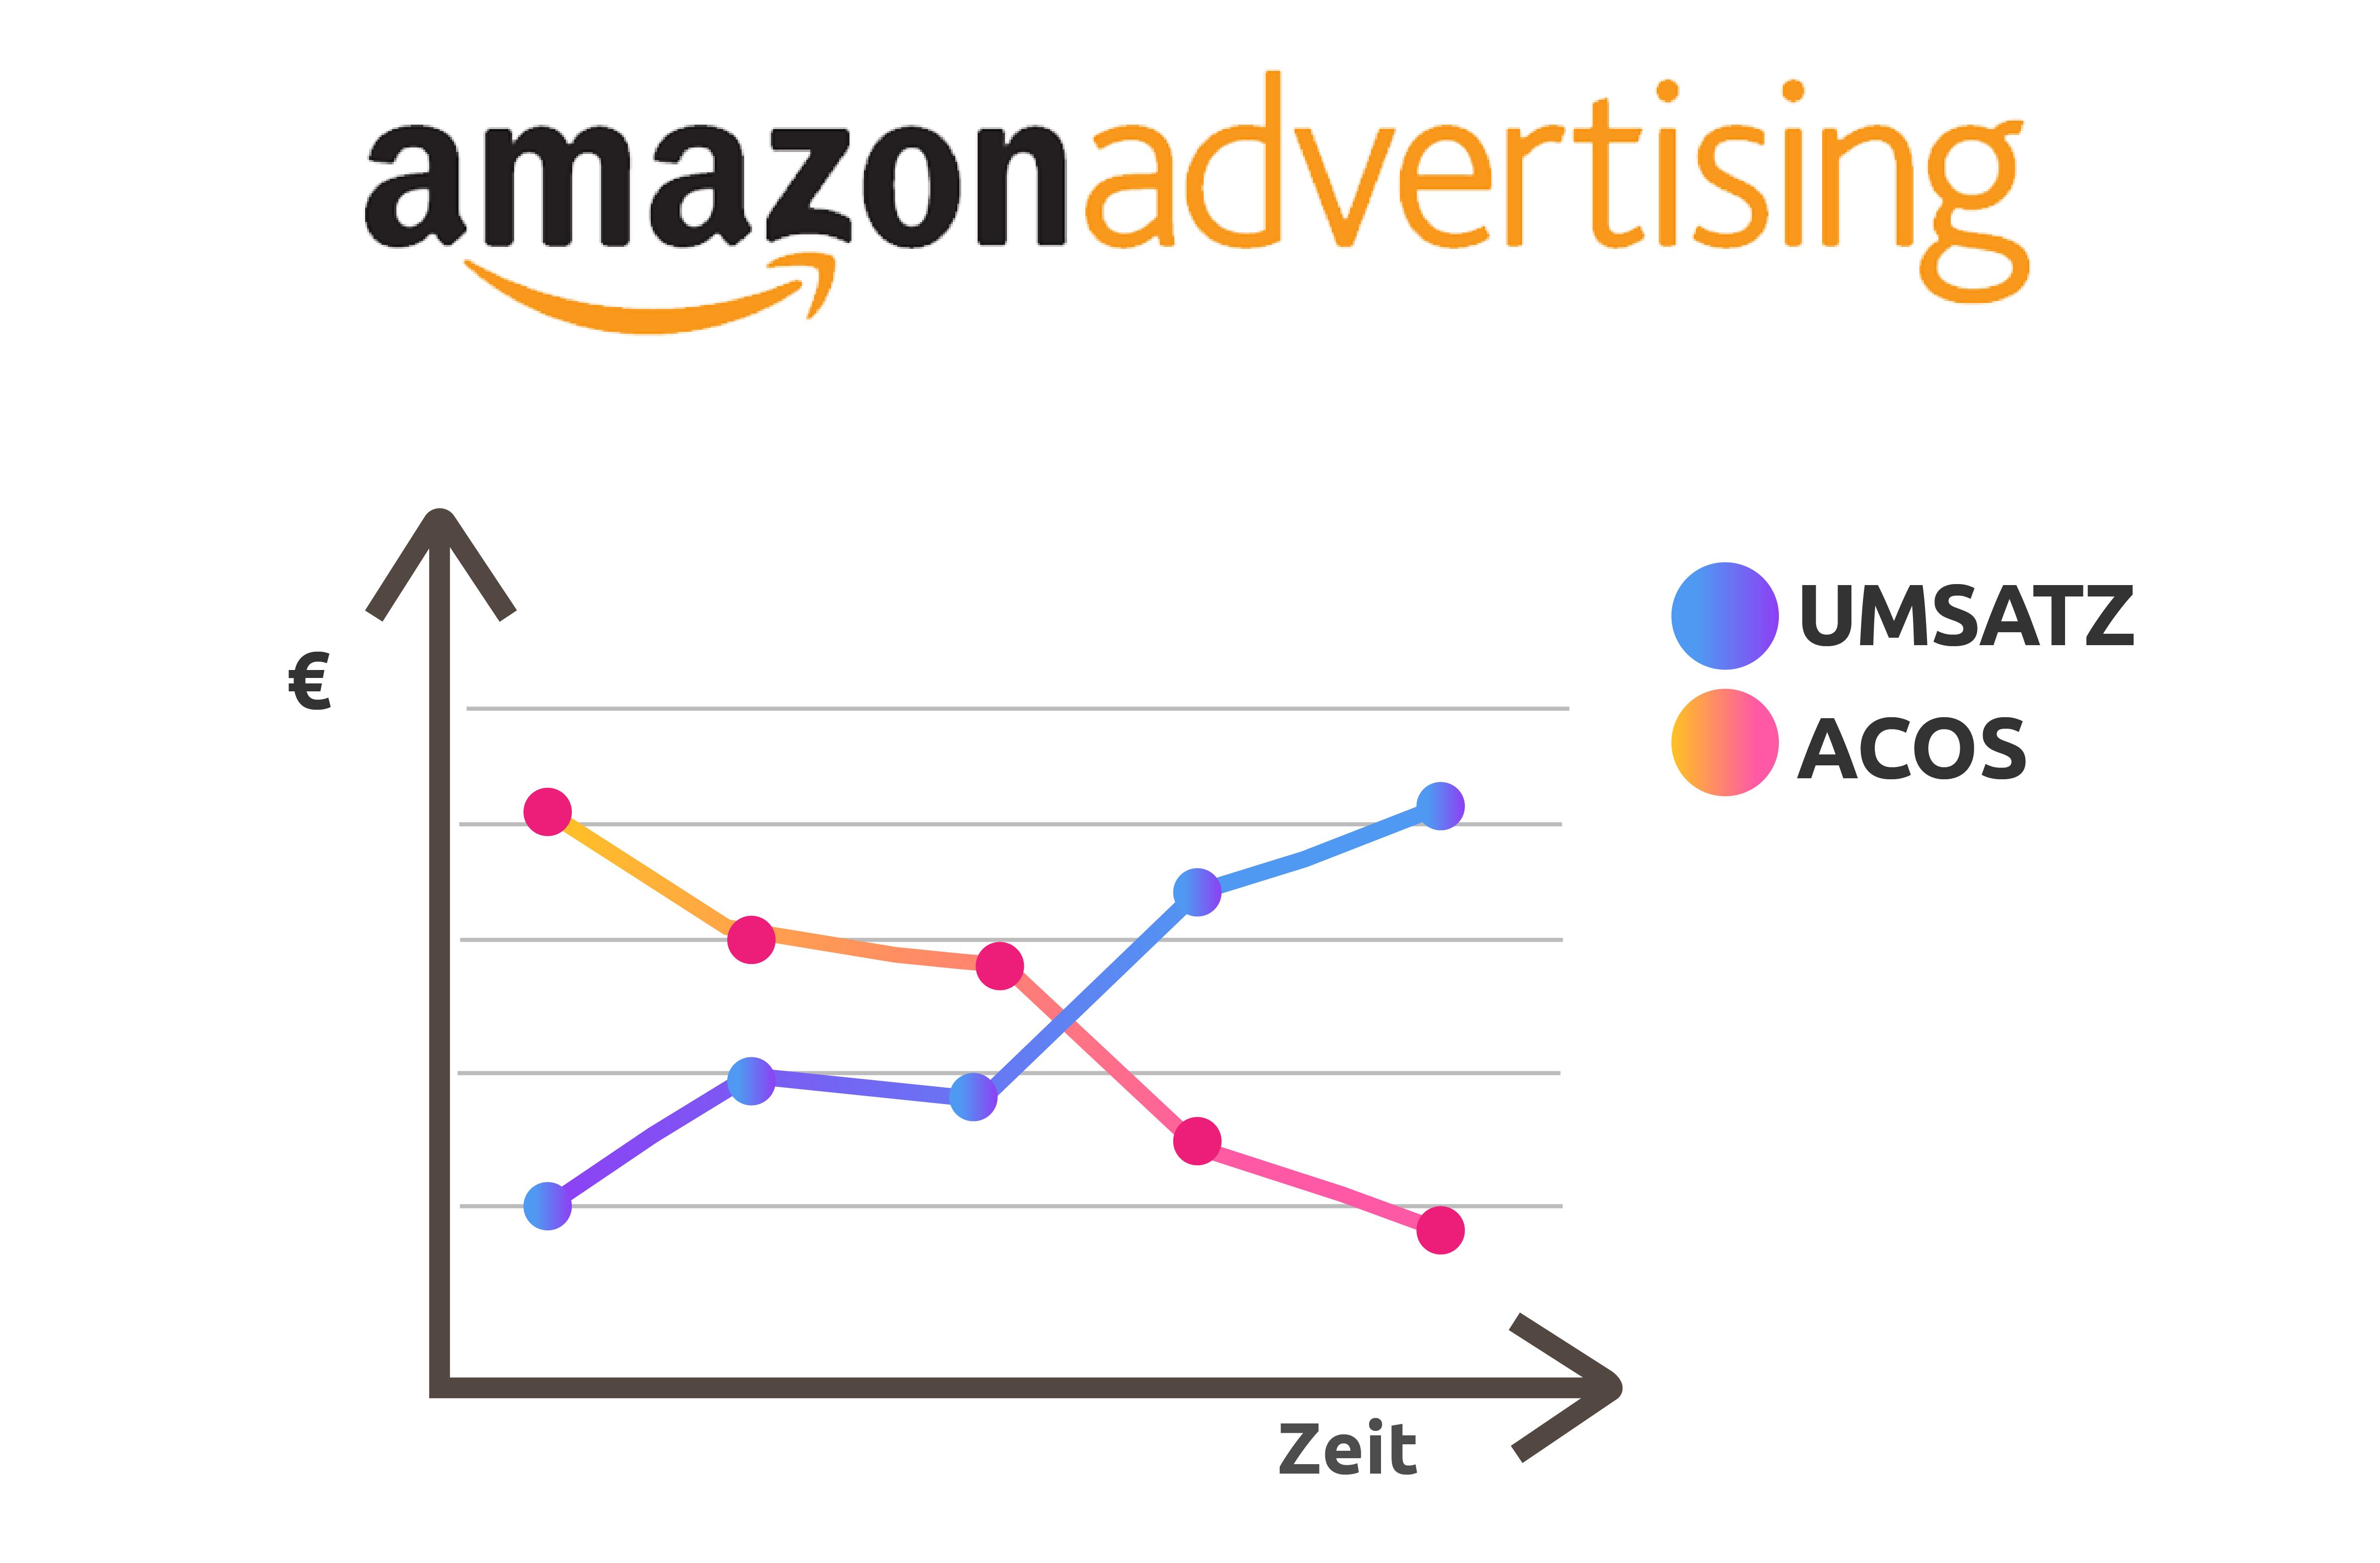 amazon.advertising